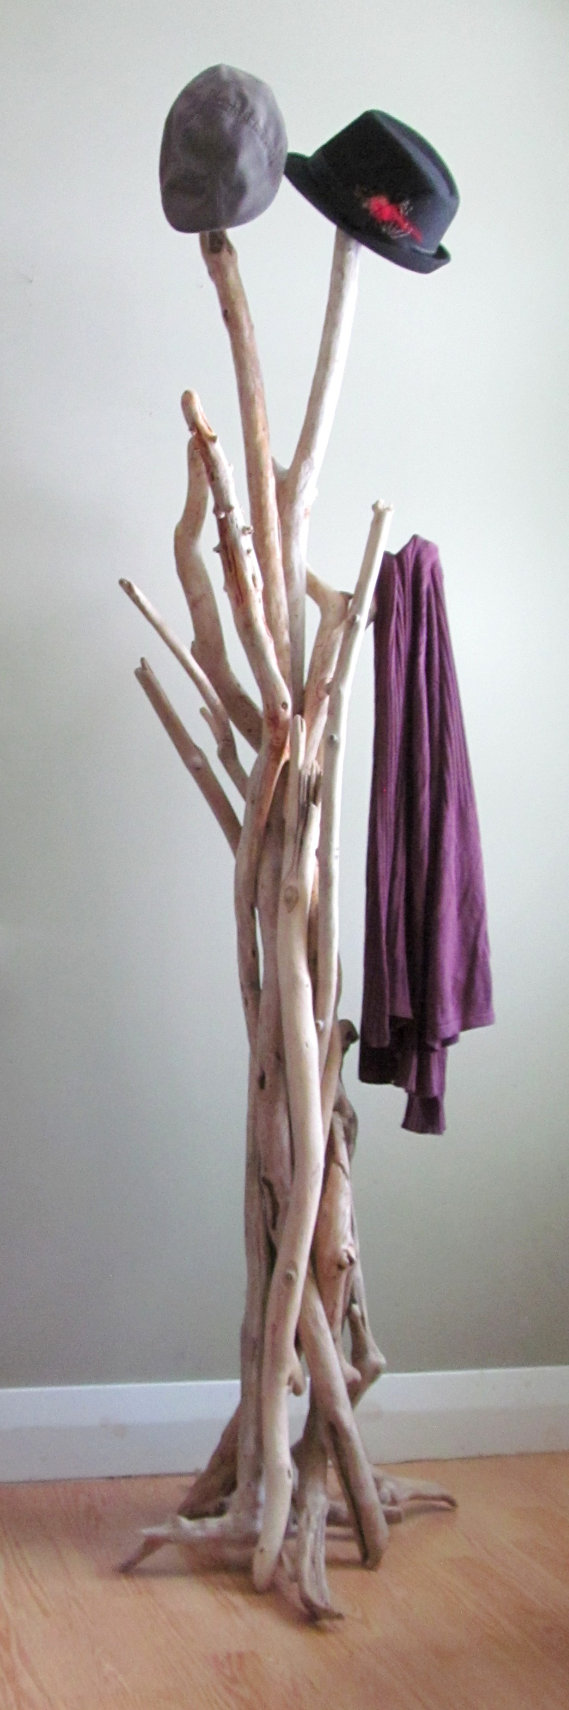 Vertically standing driftwood coat rack driftwood coat hooks wood